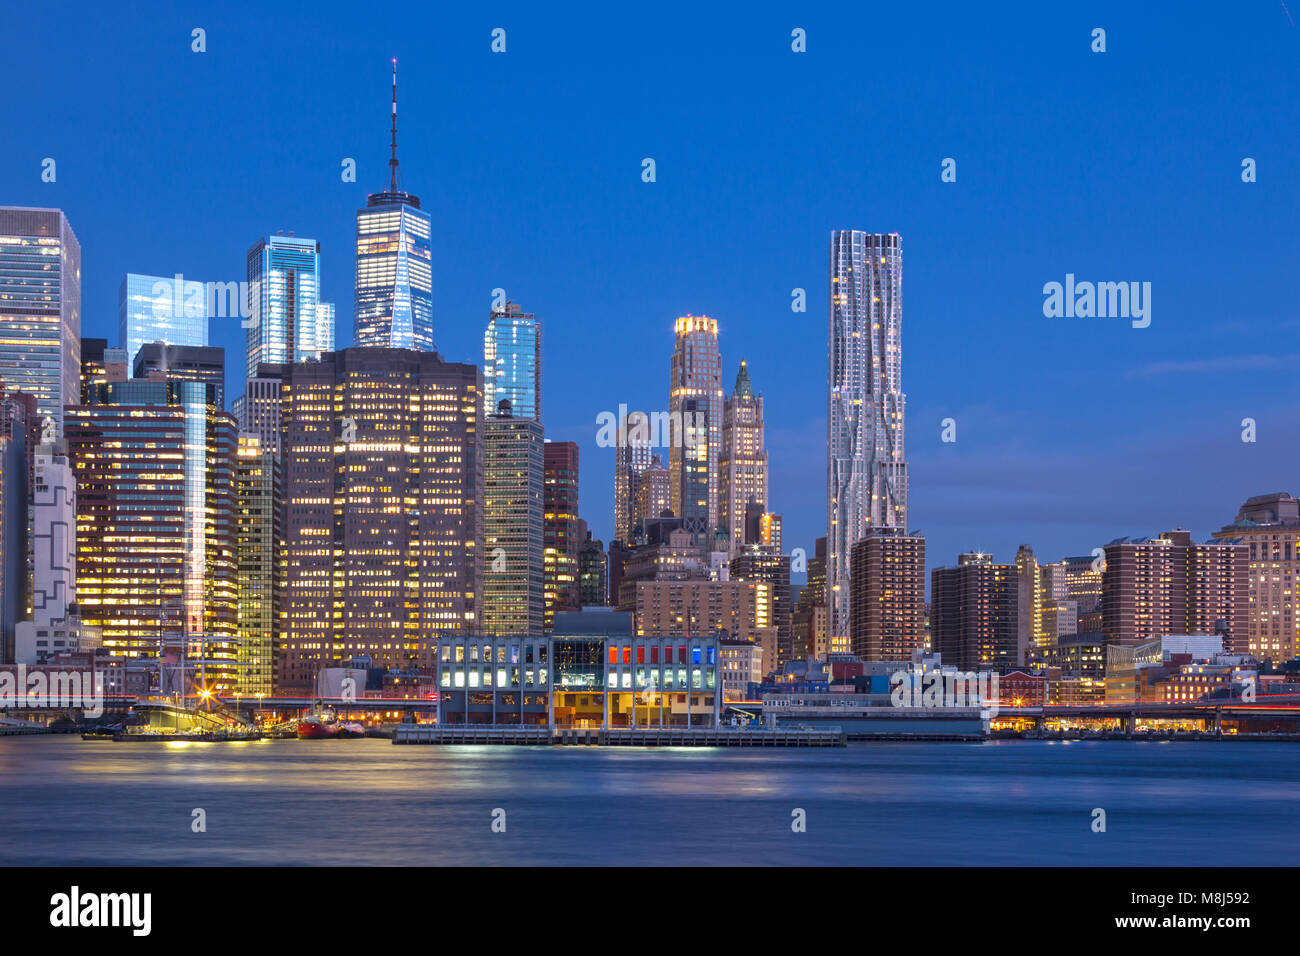 SKYLINE VON DOWNTOWN EAST RIVER MANHATTAN NEW YORK CITY USA Stockbild